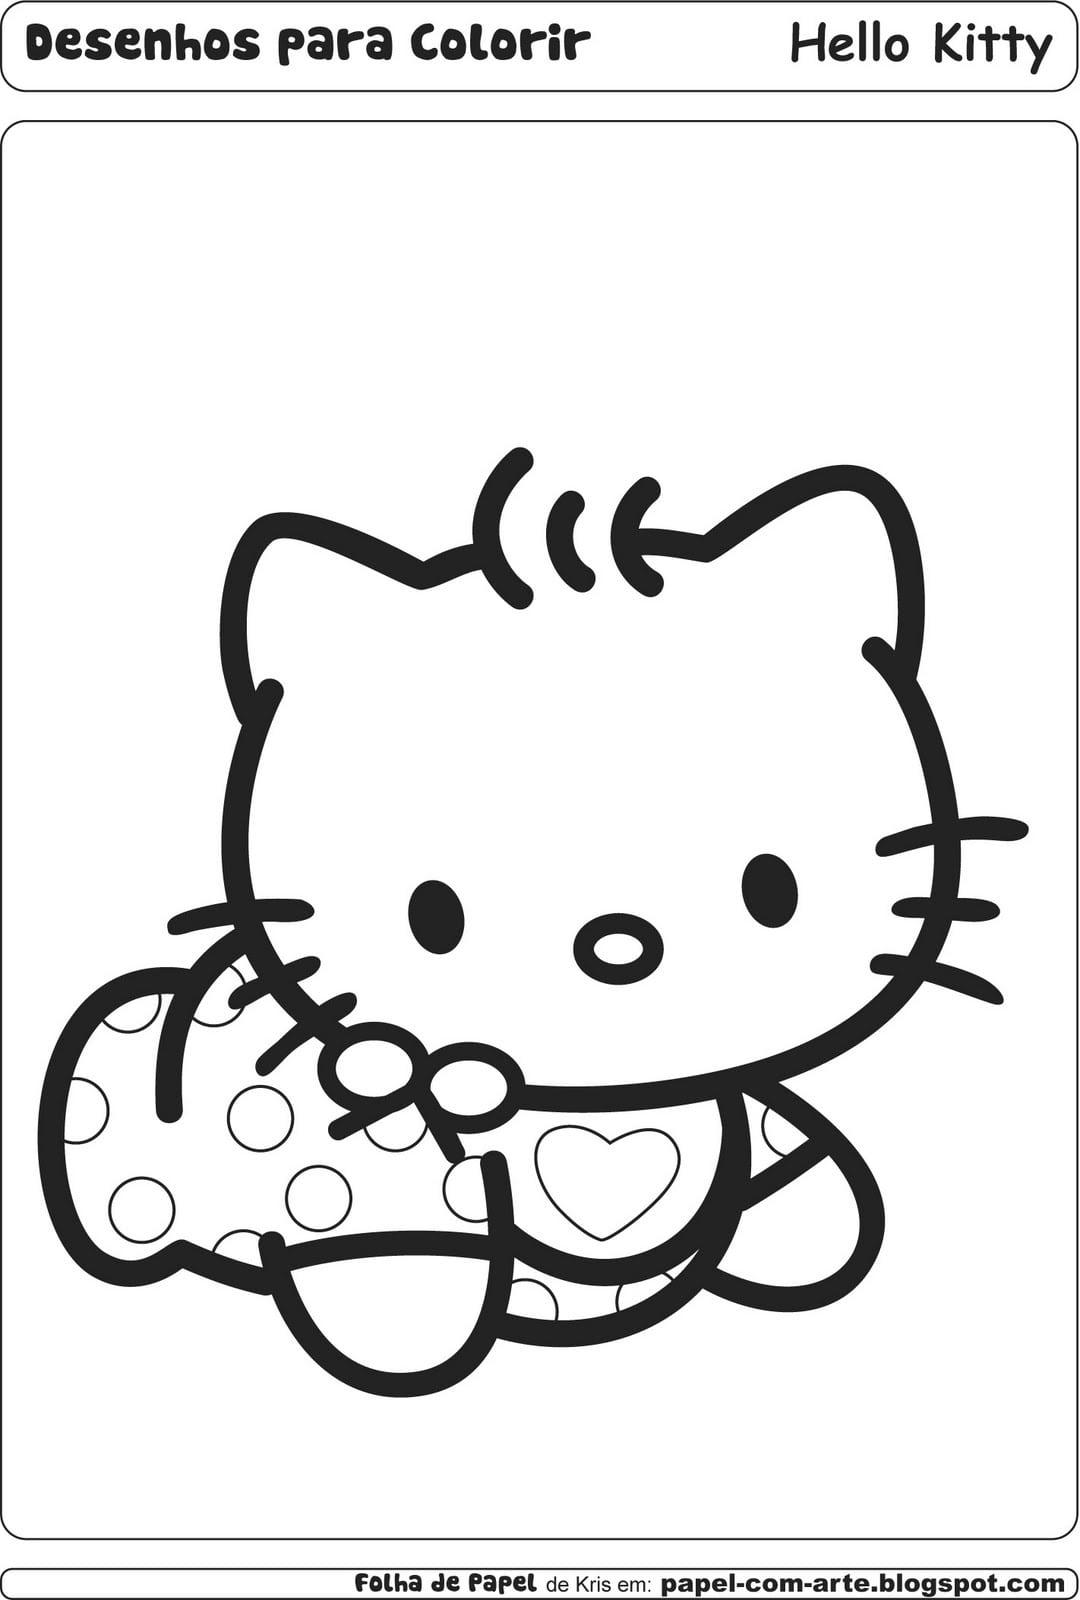 Desenhos Para Colorir Hello Kitty